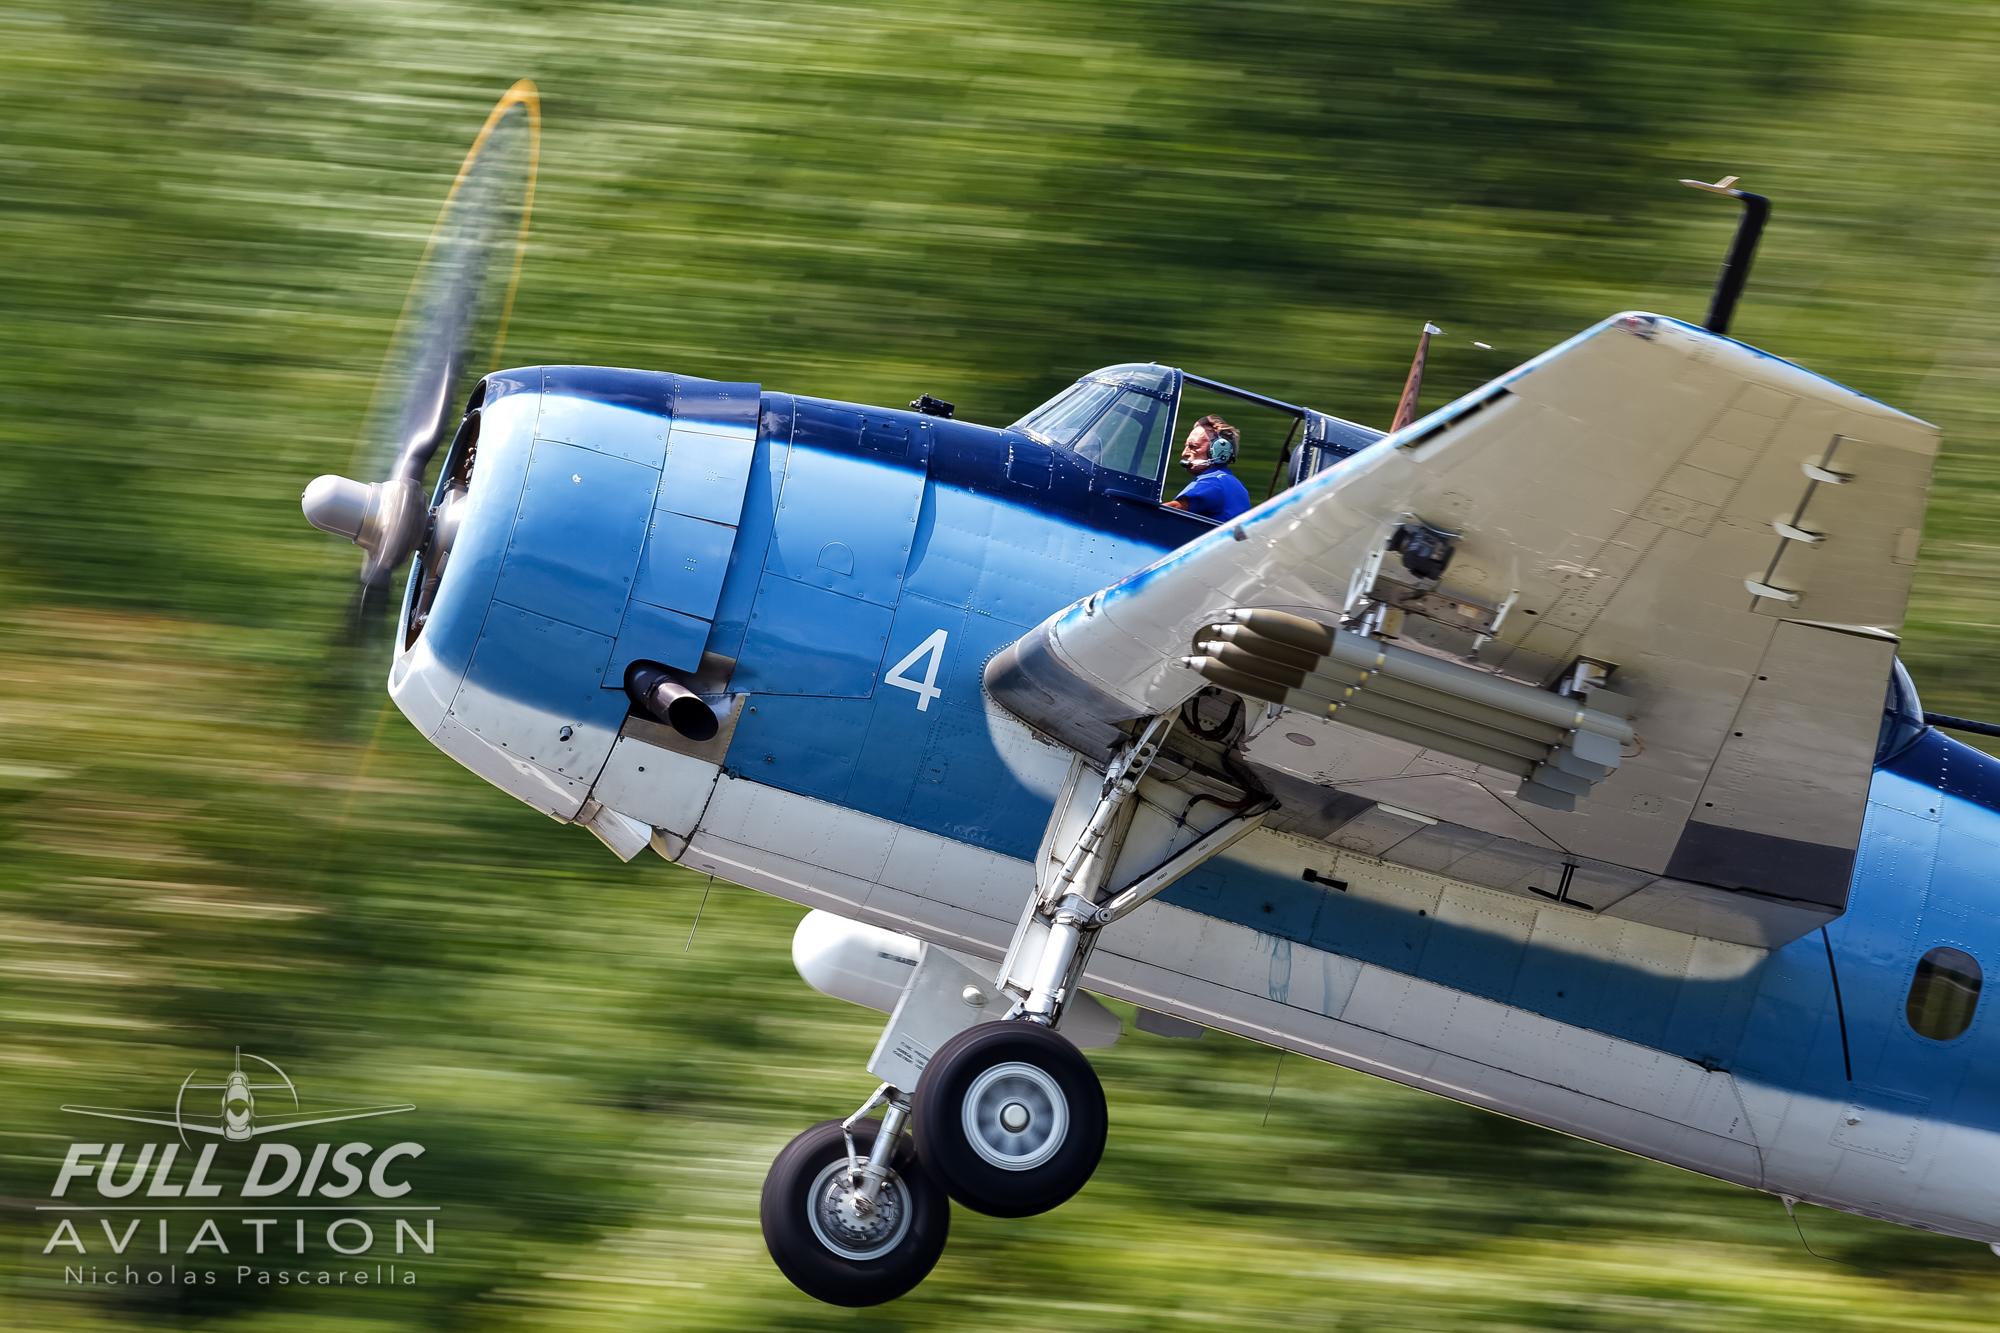 nickpascarella_nicholaspascarella_fulldiscaviation_aircraft_tbmavenger_takeoff.jpg